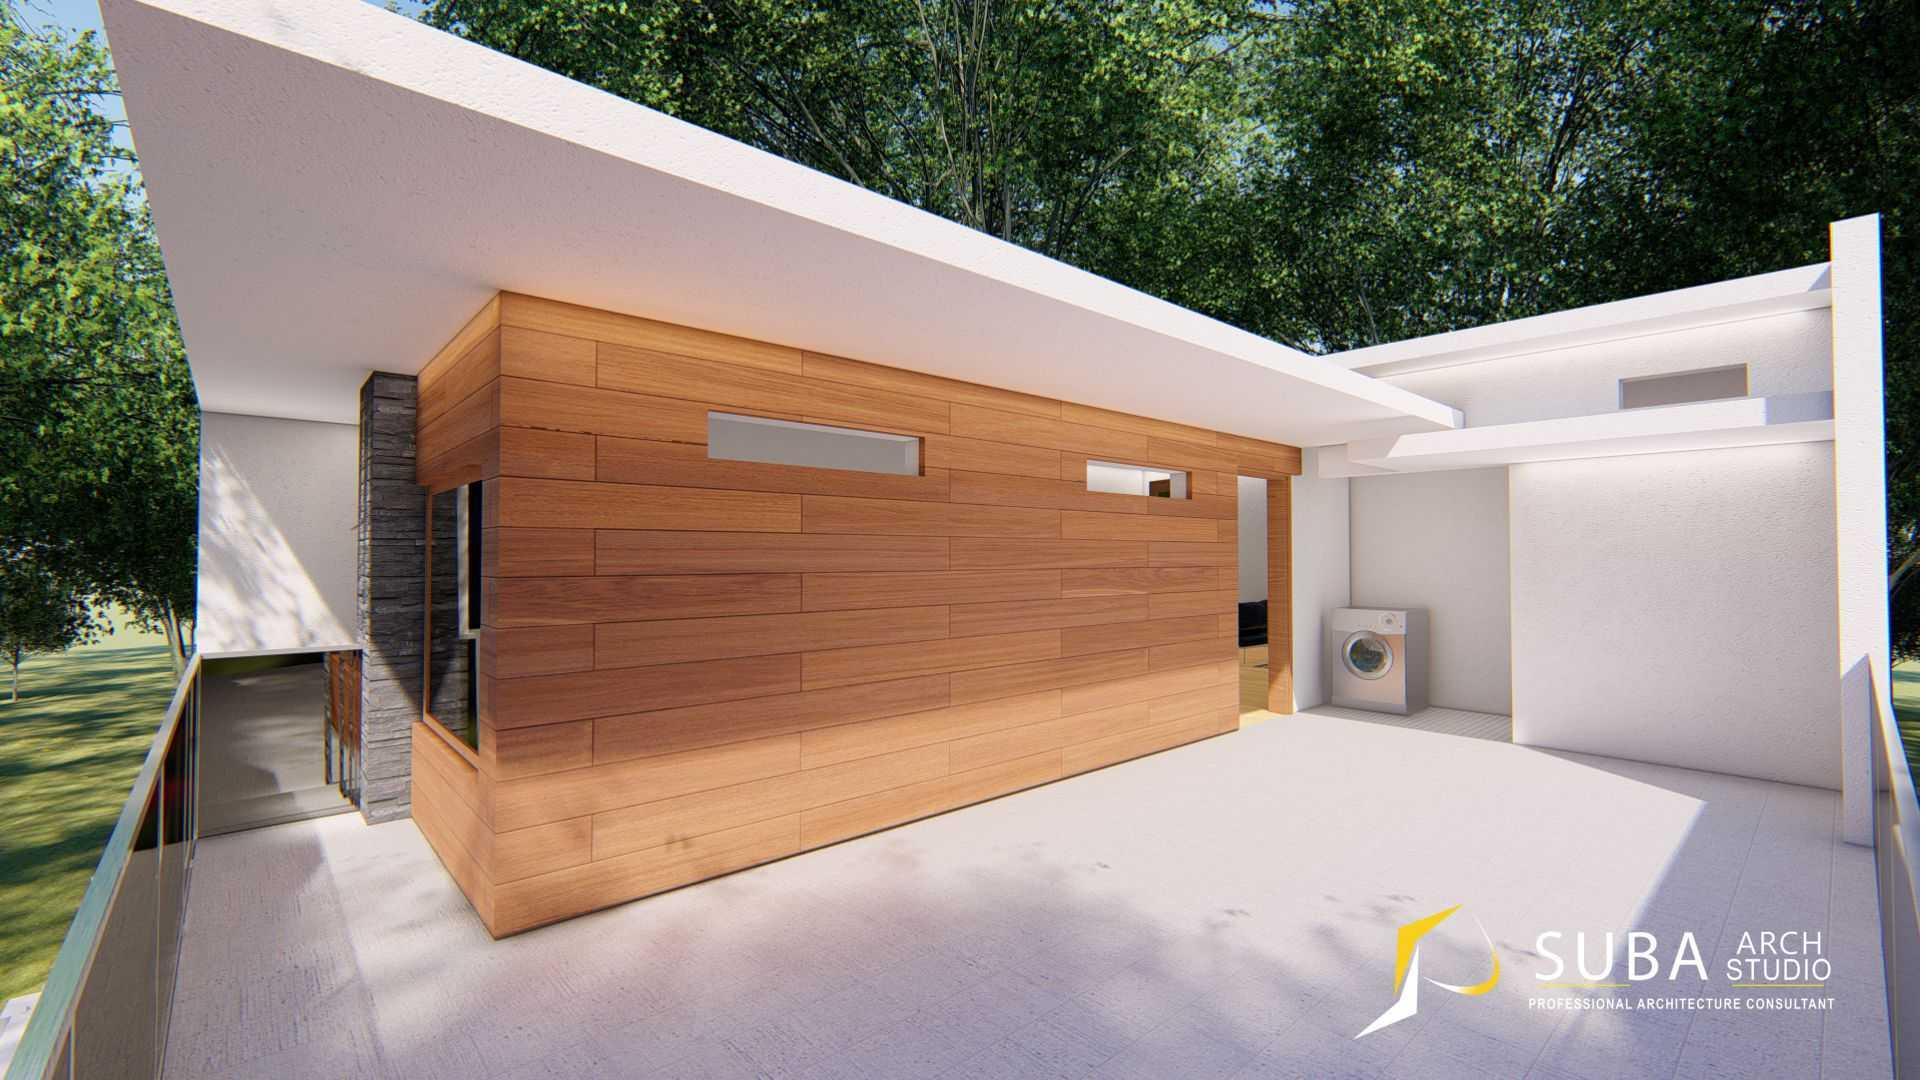 Foto inspirasi ide desain laundry Suba-arch-rumah-modern-kontemporer-cibeureum-sukabumi oleh SUBA-Arch di Arsitag